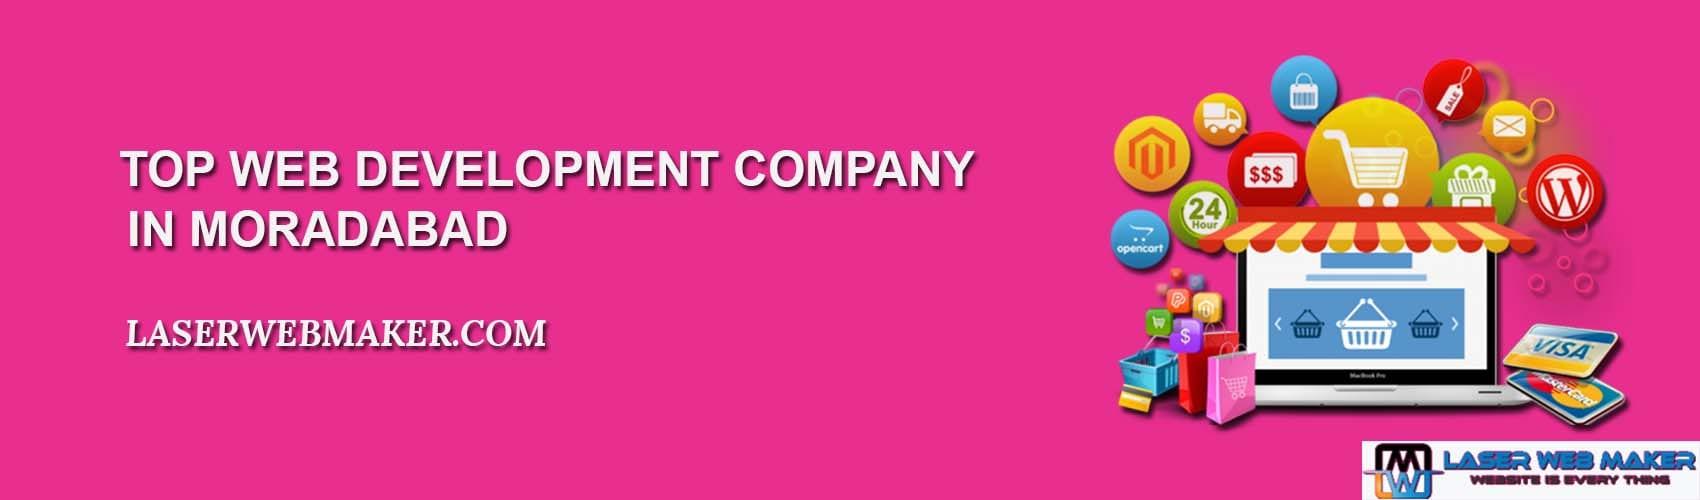 Top Web Development Company In Moradabad